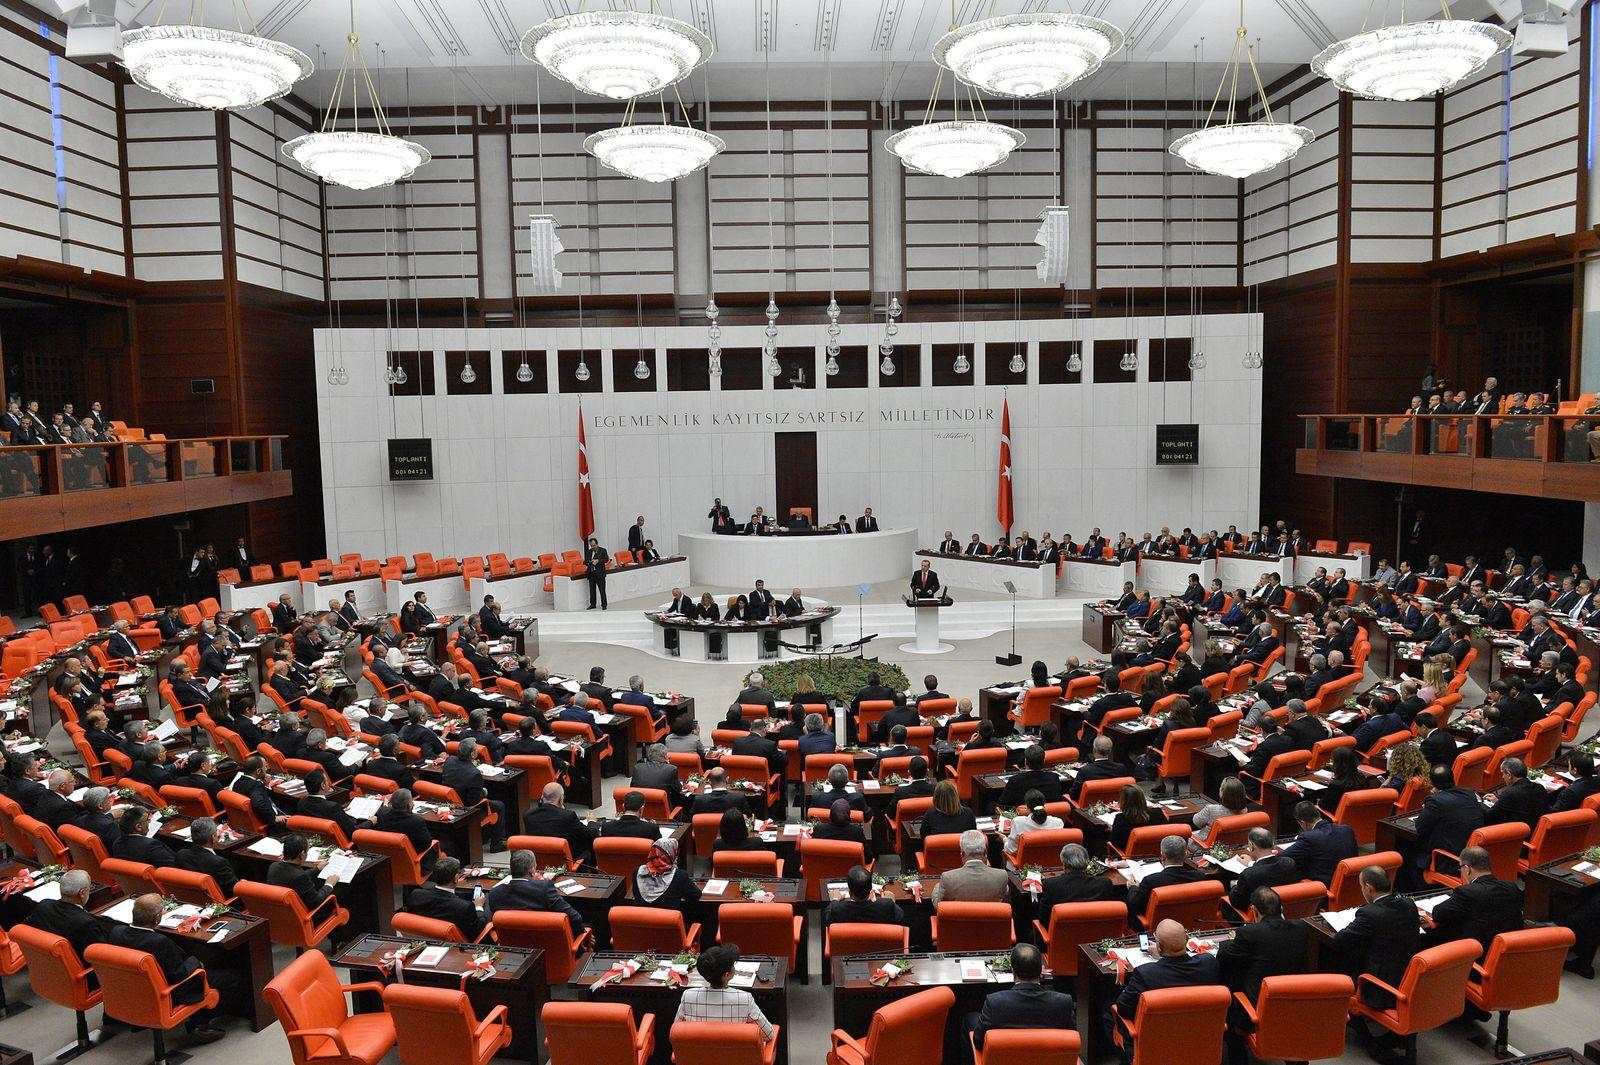 Turkish President Recep Tayyip Erdogan speaks at the parliament